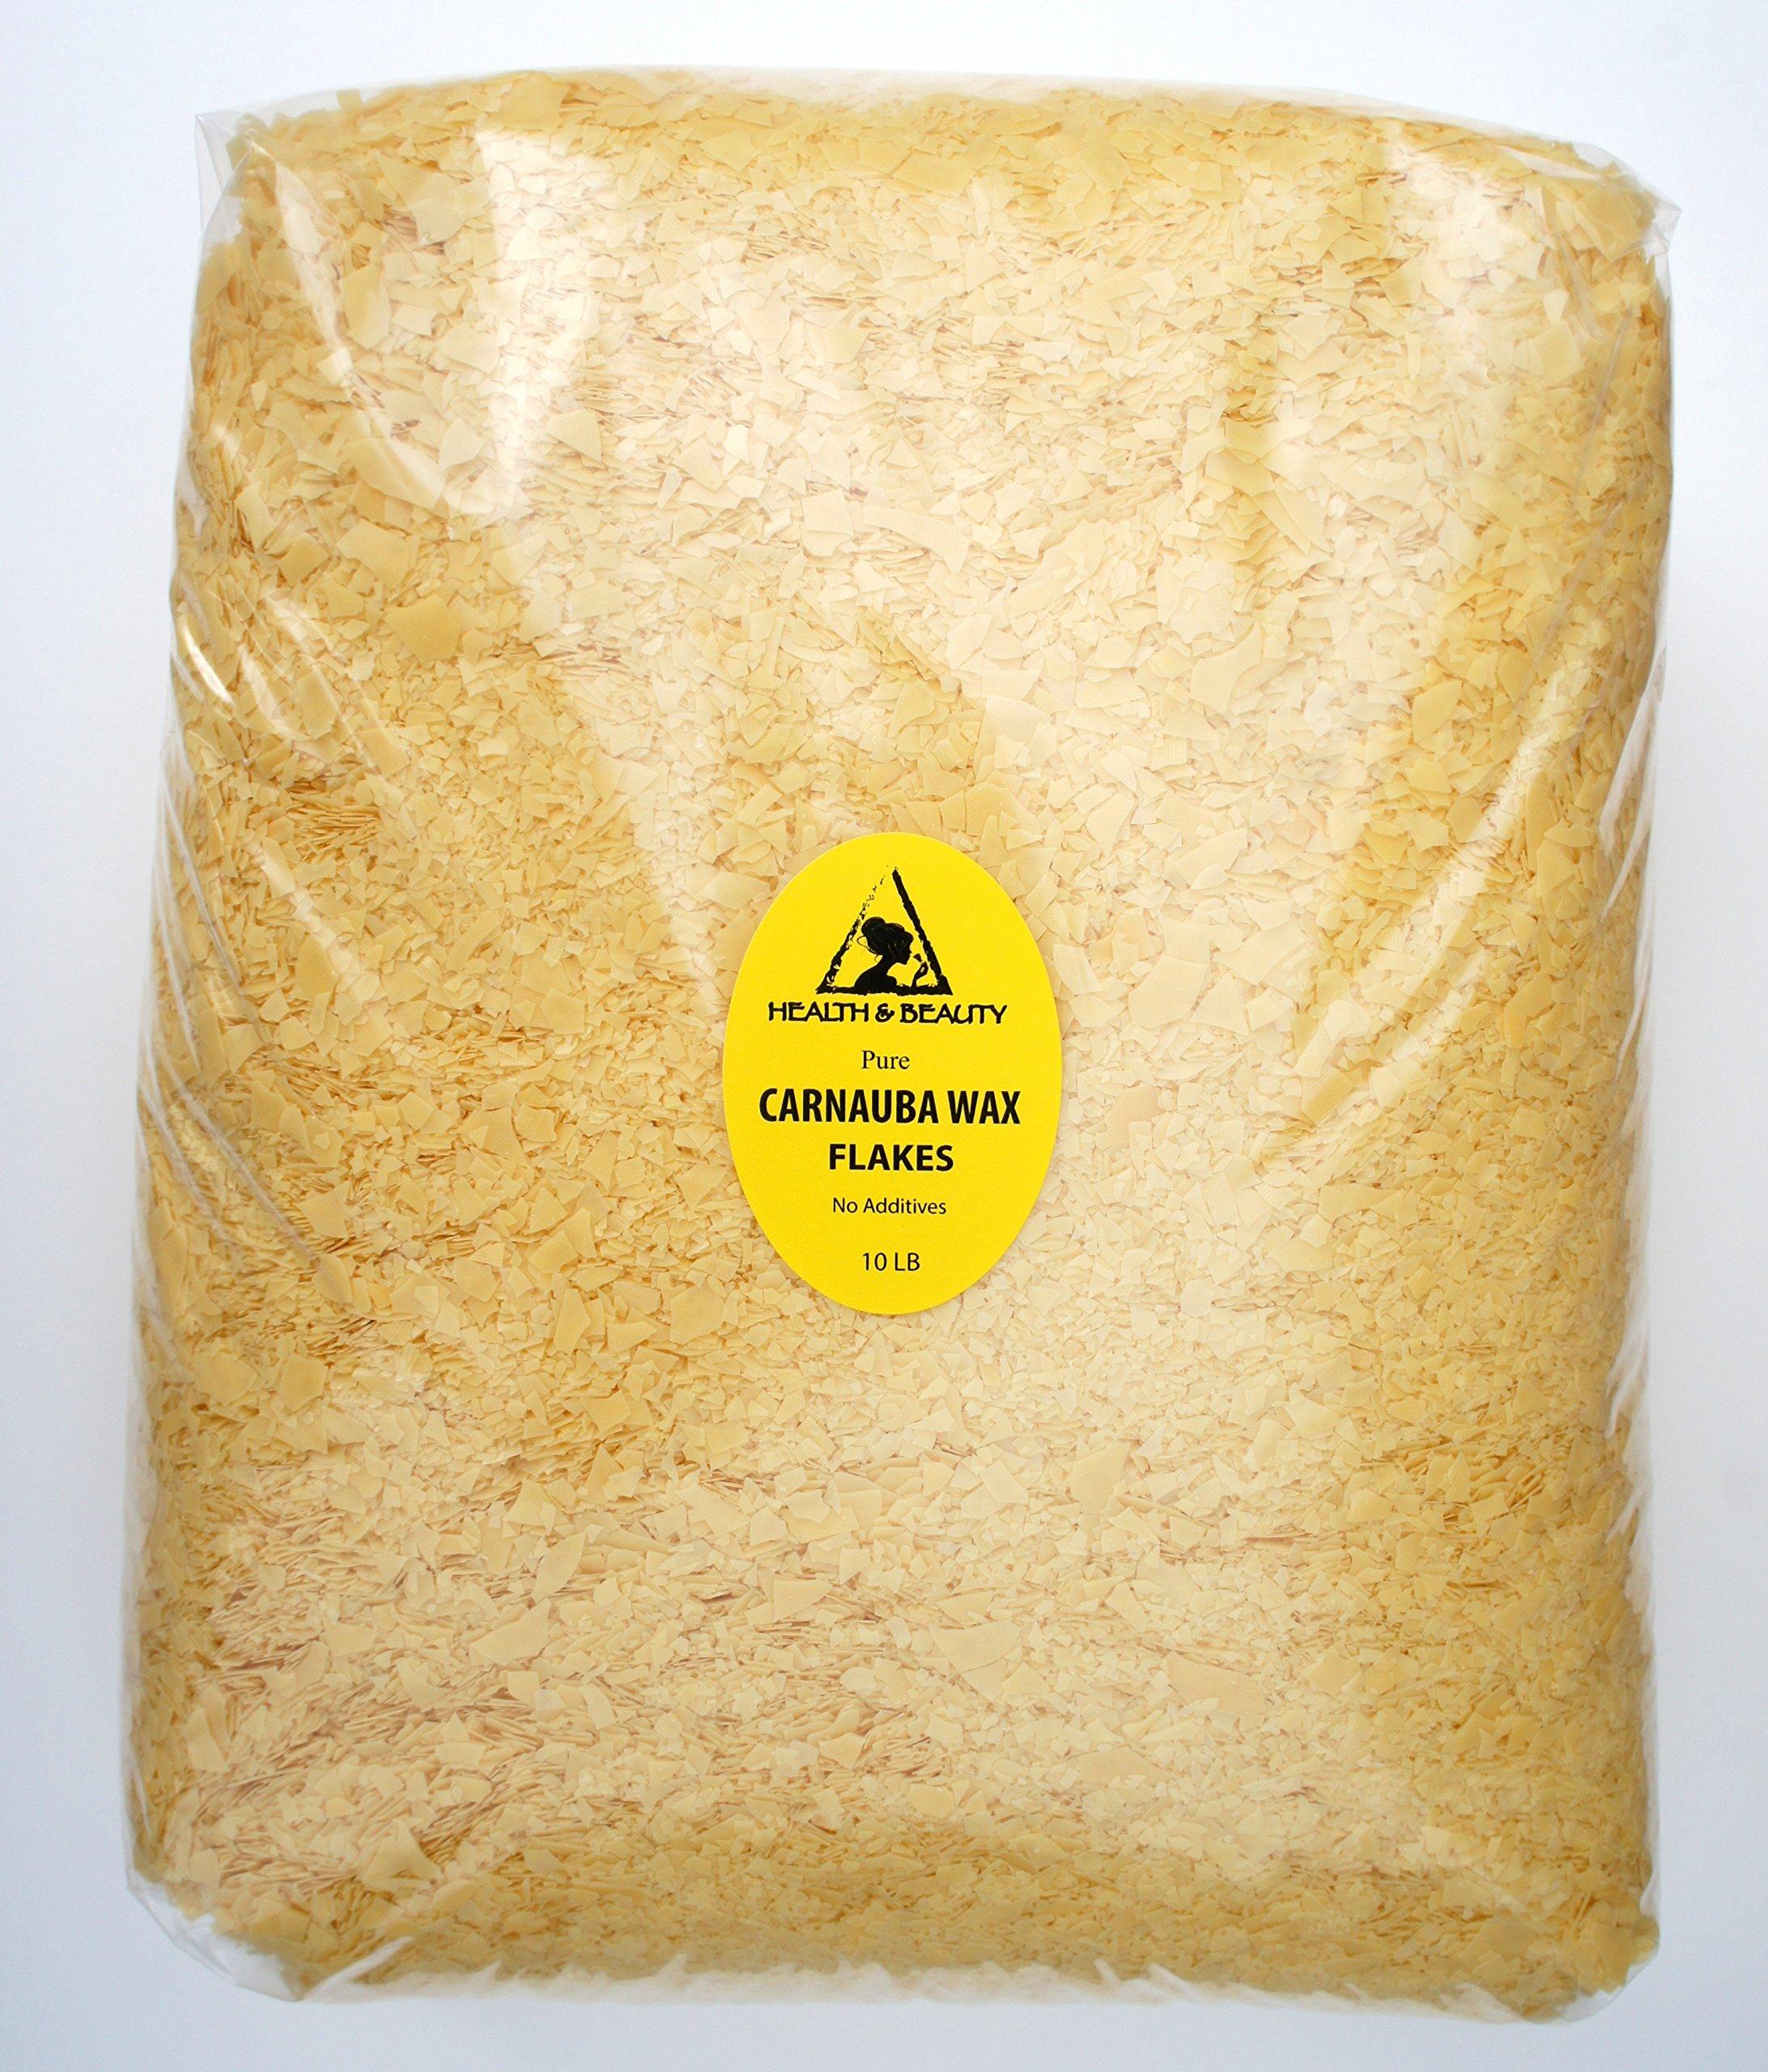 Carnauba Wax Organic Flakes Brazil Pastilles Beards Premium Prime Grade A 100% Pure 10 LB by H&B Oils Center Co.